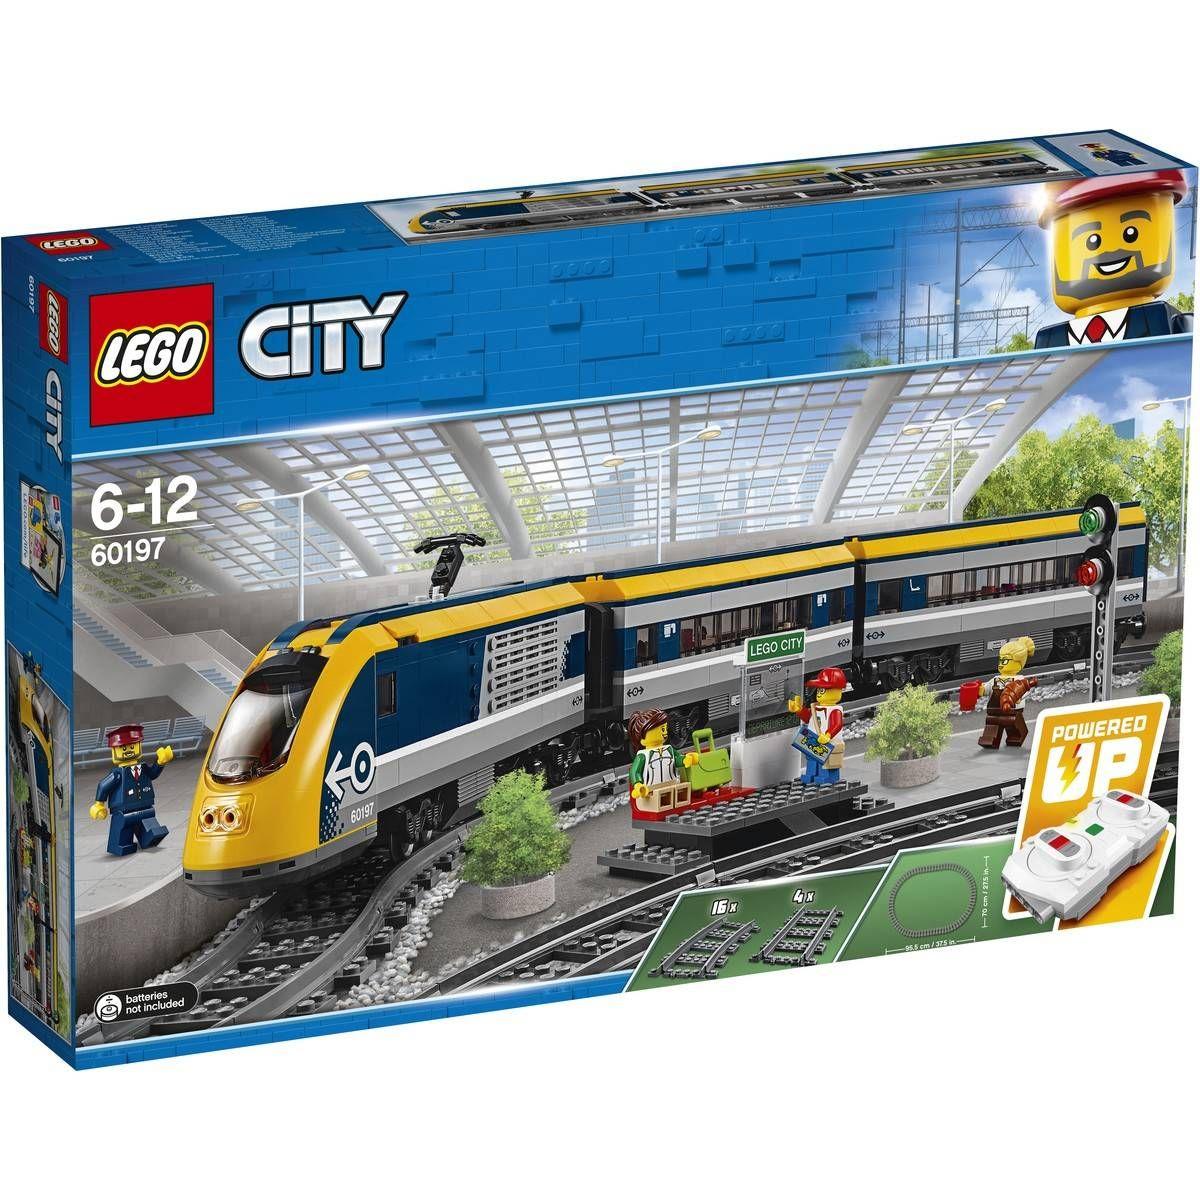 Lego City Trains Passenger Train 60197 Lego City Train Lego City Train